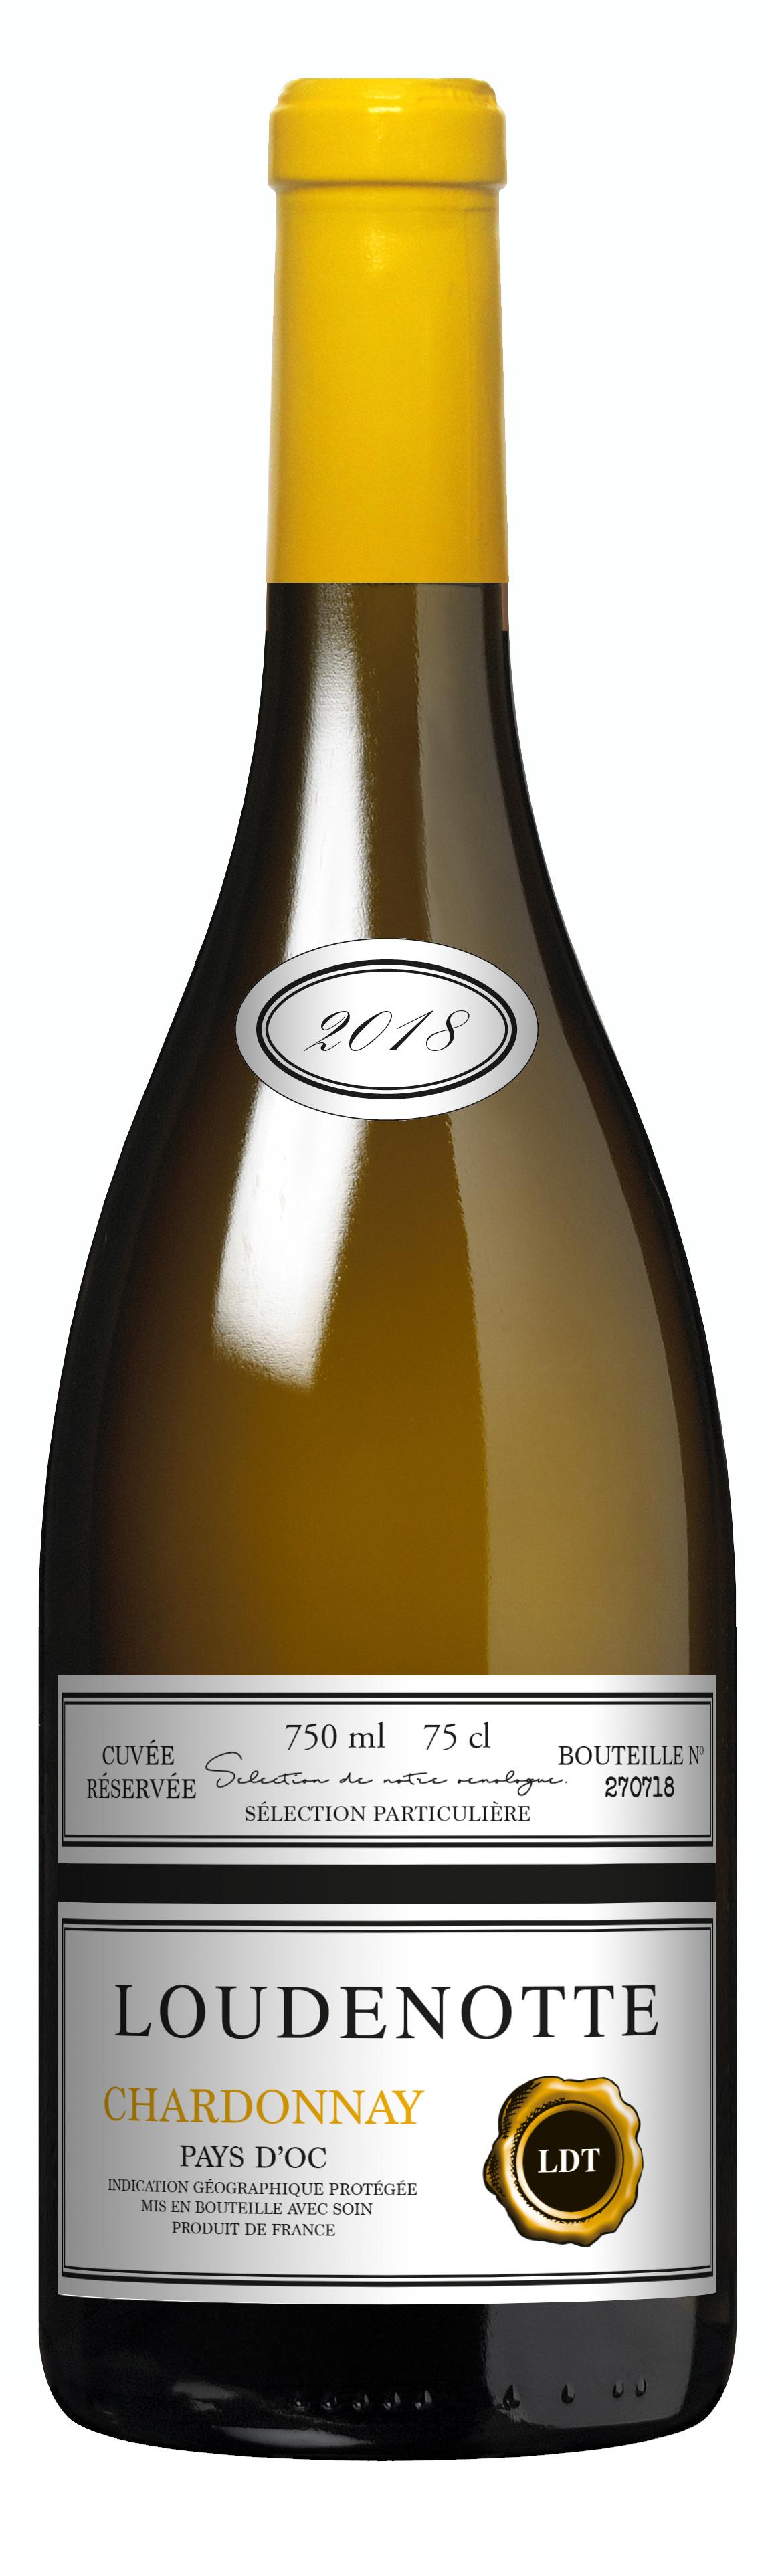 Loudenotte Chardonnay, Cuvee Reservee